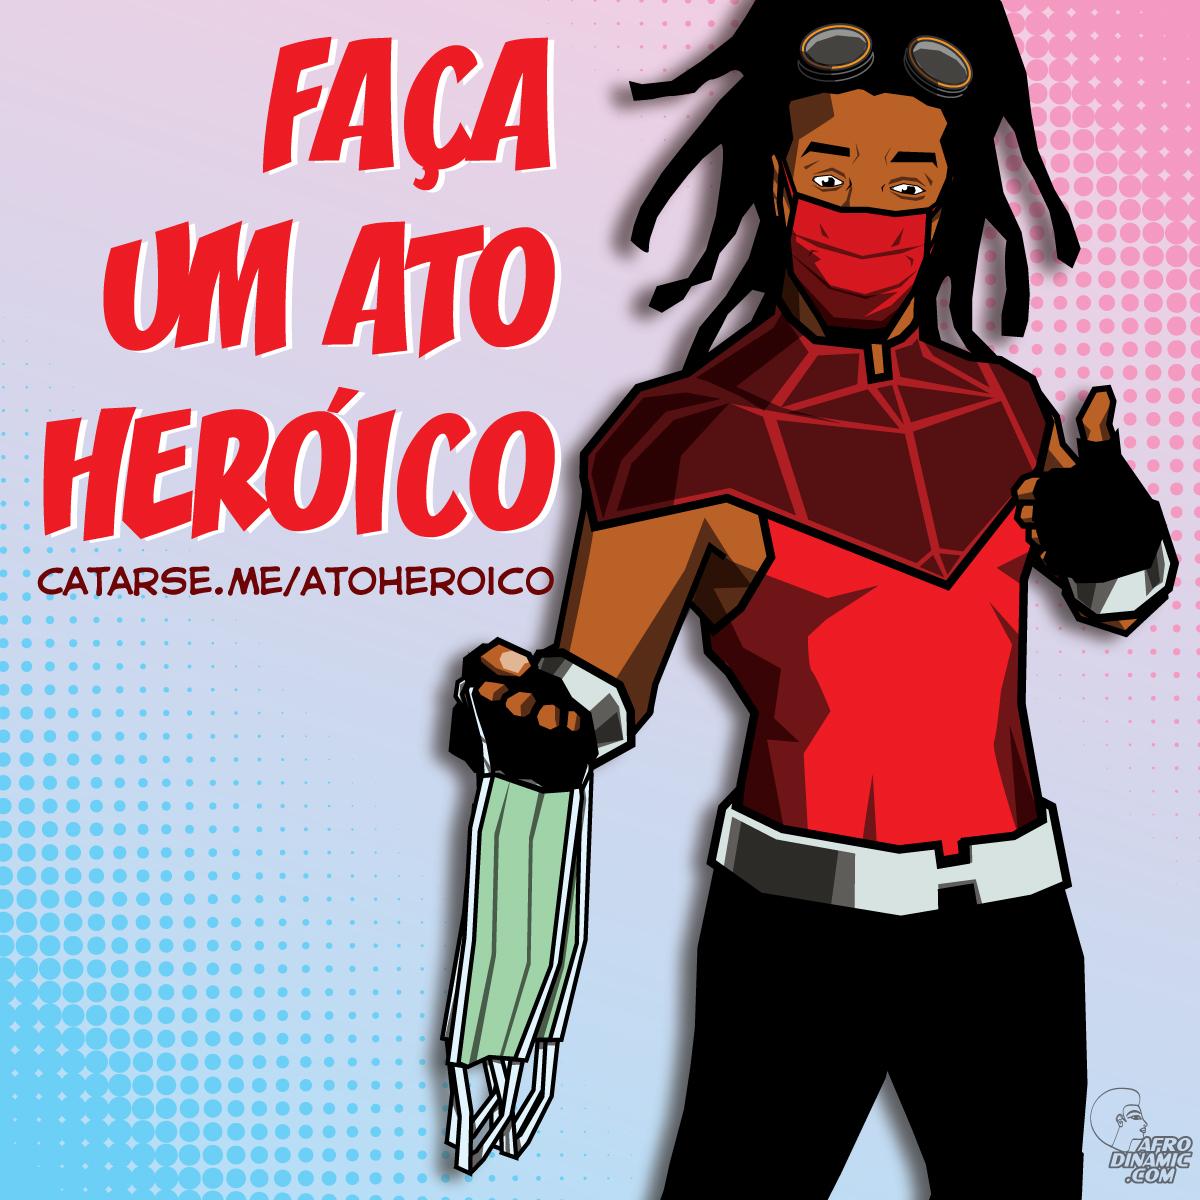 Heroi_atoHeroico_B